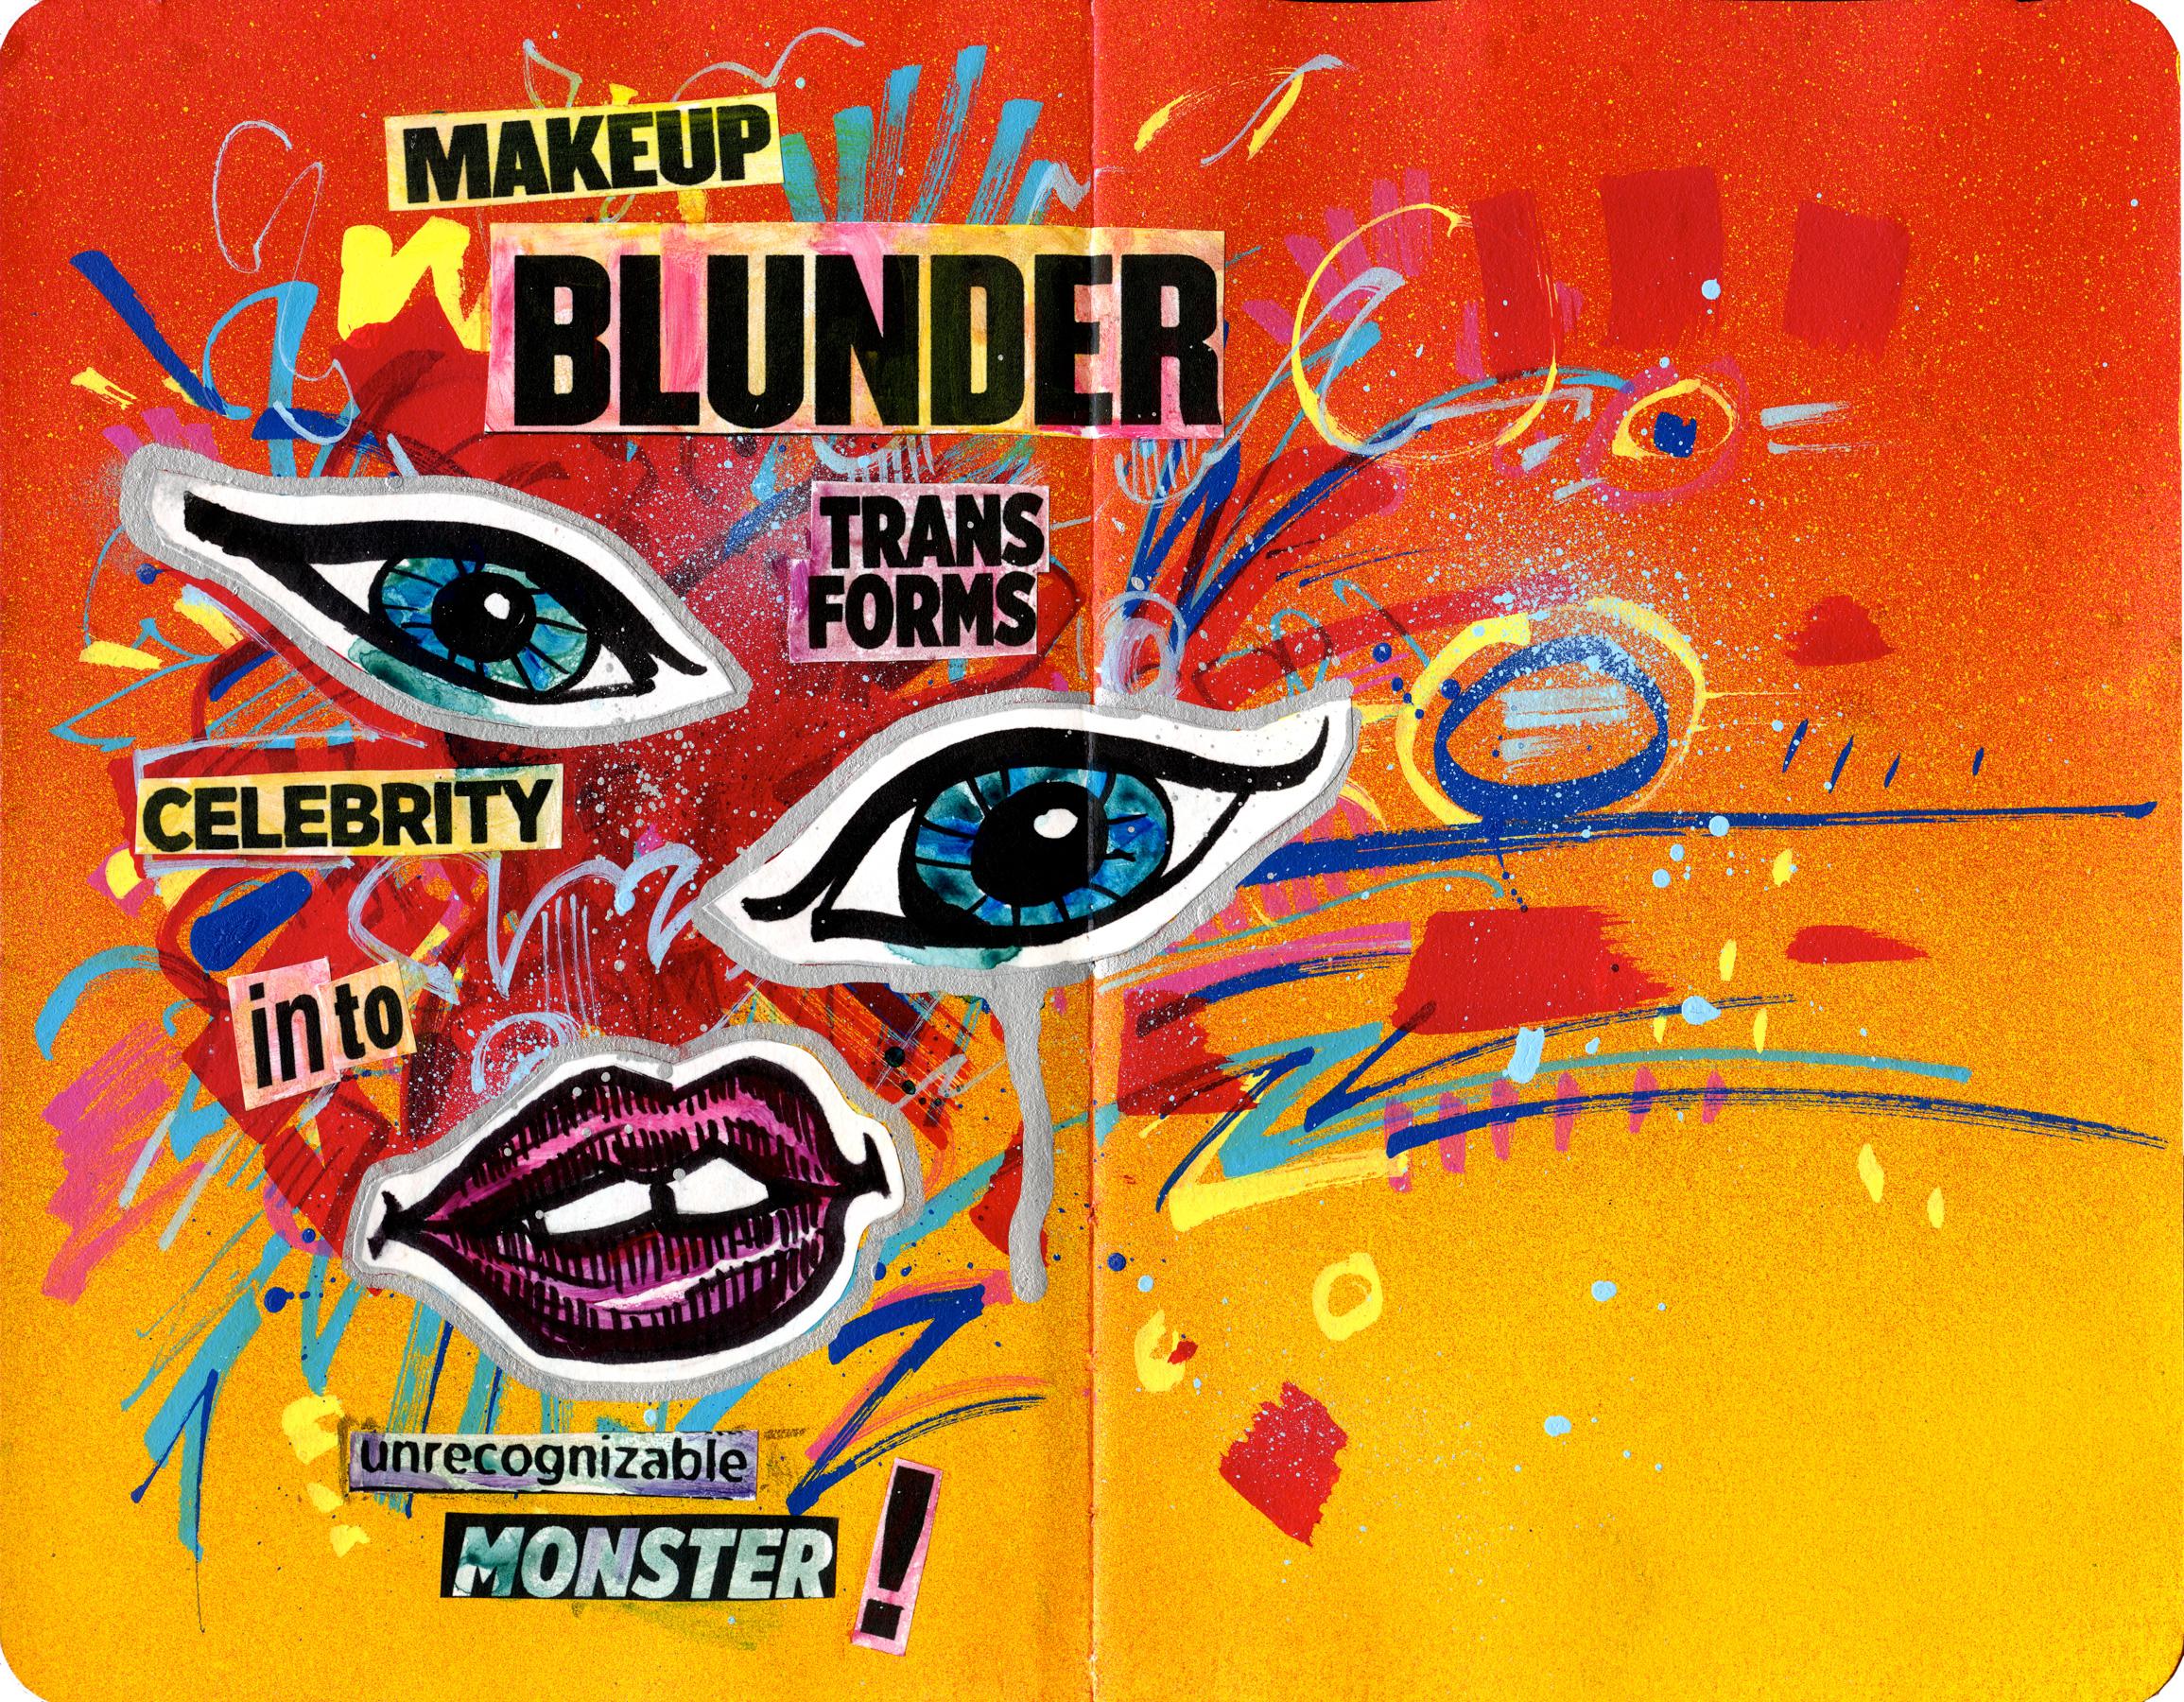 Makeup Blunder